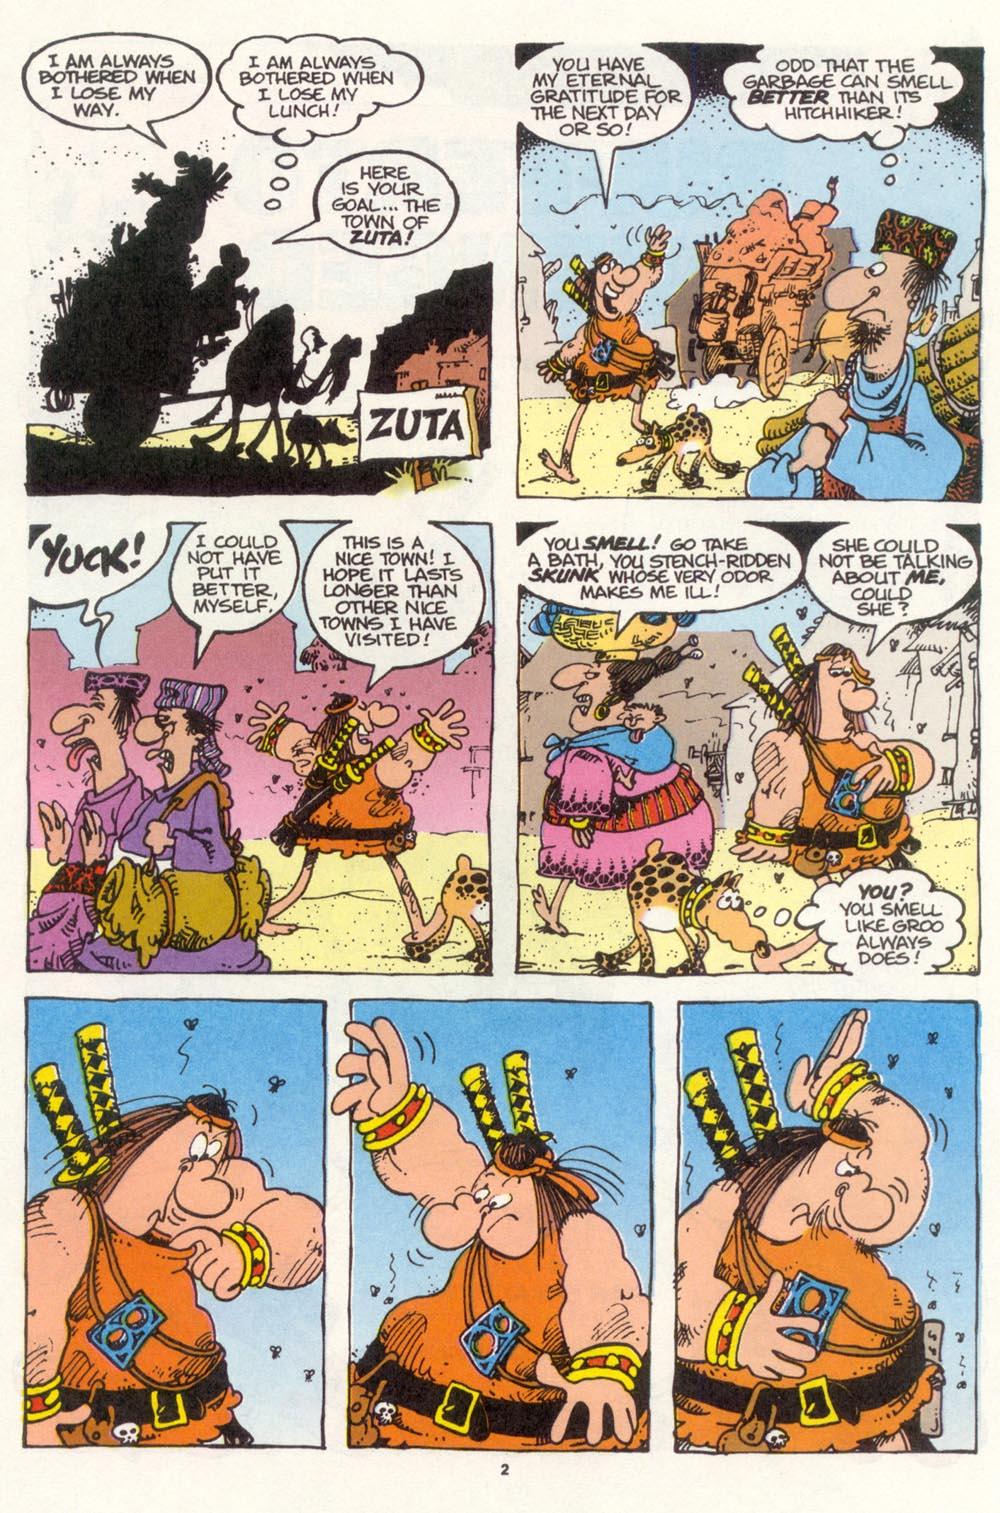 Read online Sergio Aragonés Groo the Wanderer comic -  Issue #112 - 4